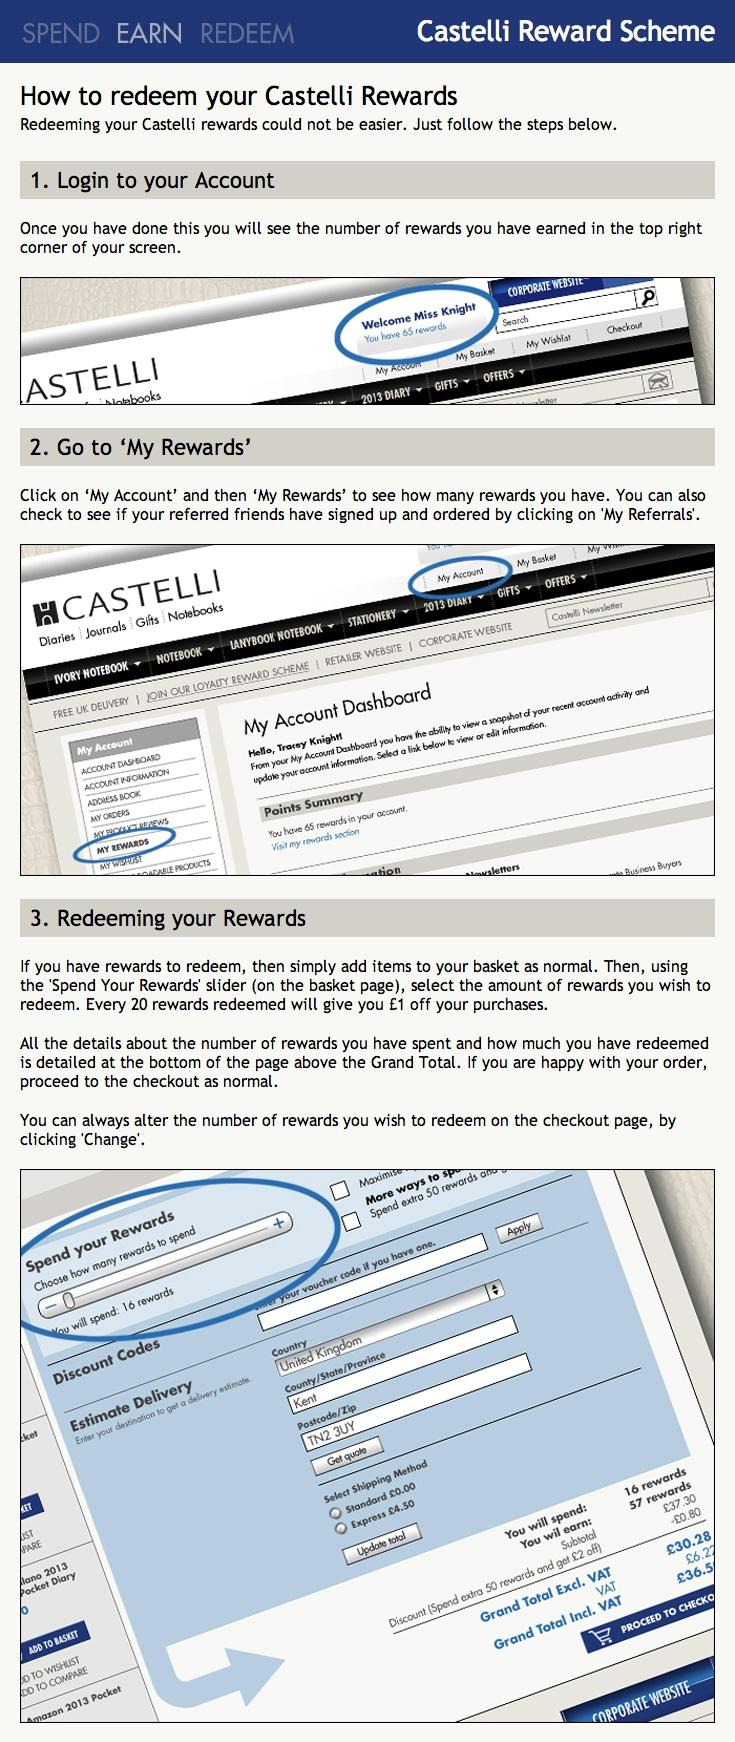 How to Redeem Rewards from @CastelliUK (by @jrtecommerce) | Showcase: www.sweettoothrewards.com/client-showcase